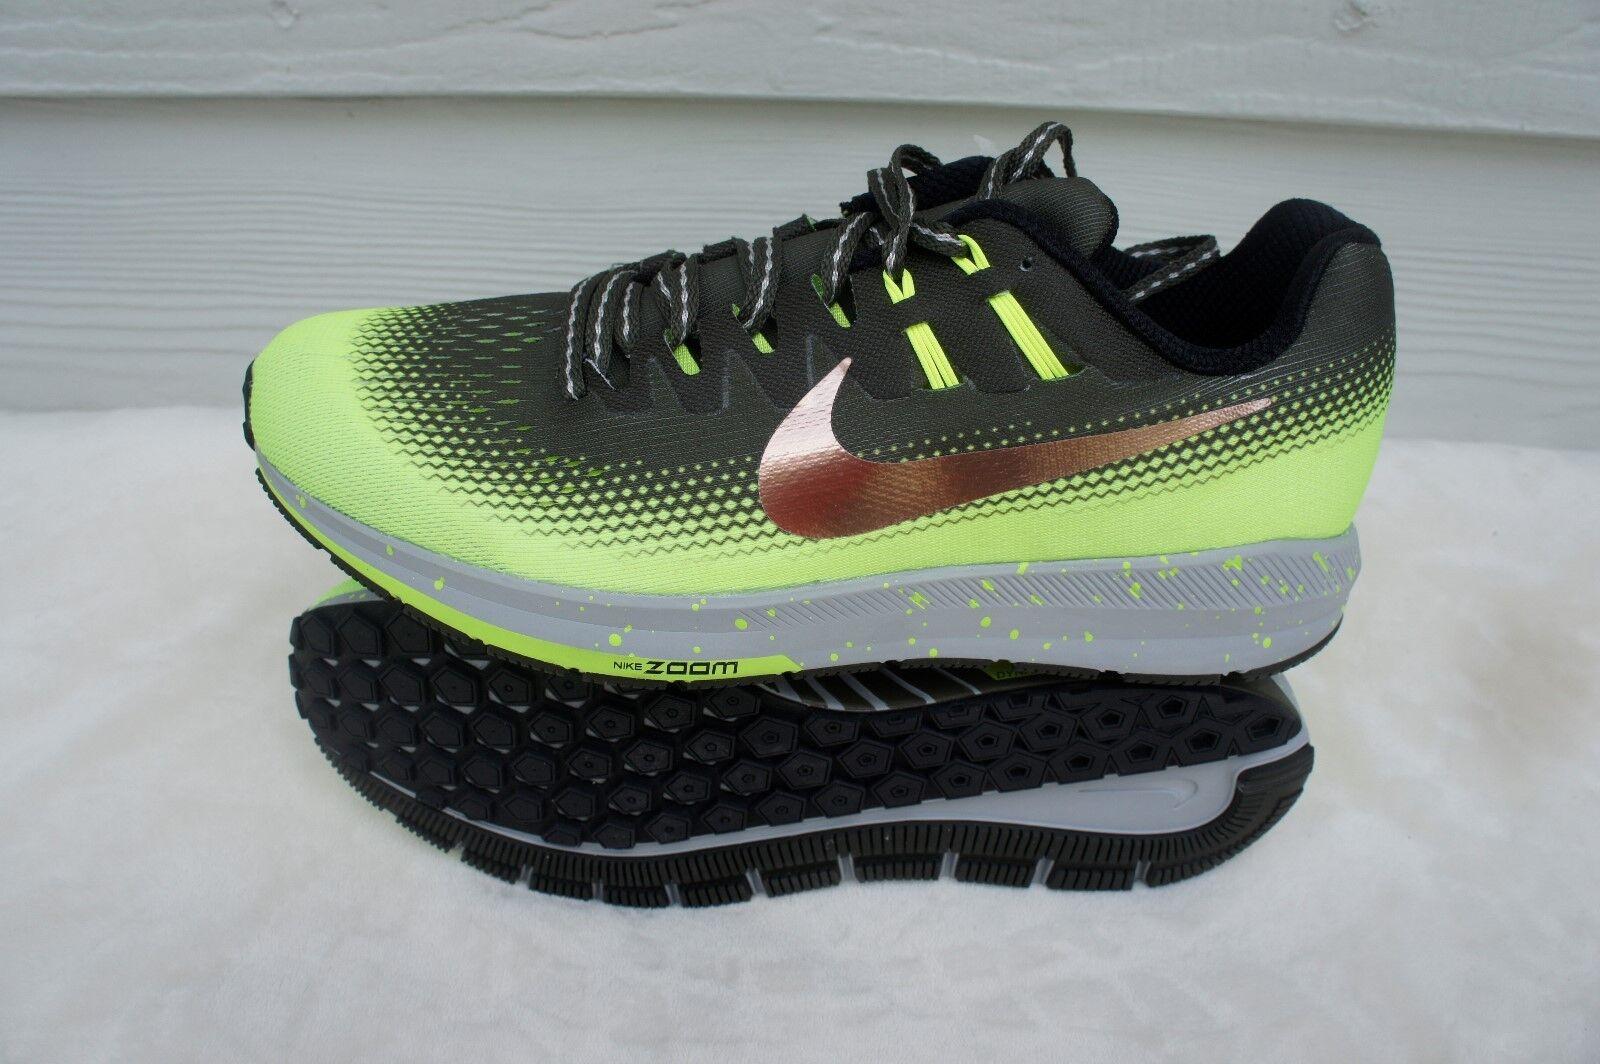 brand new ad9f2 e8f5f ... canada mens nike shox current running shoes sz 10 black ebay 38894 86d74